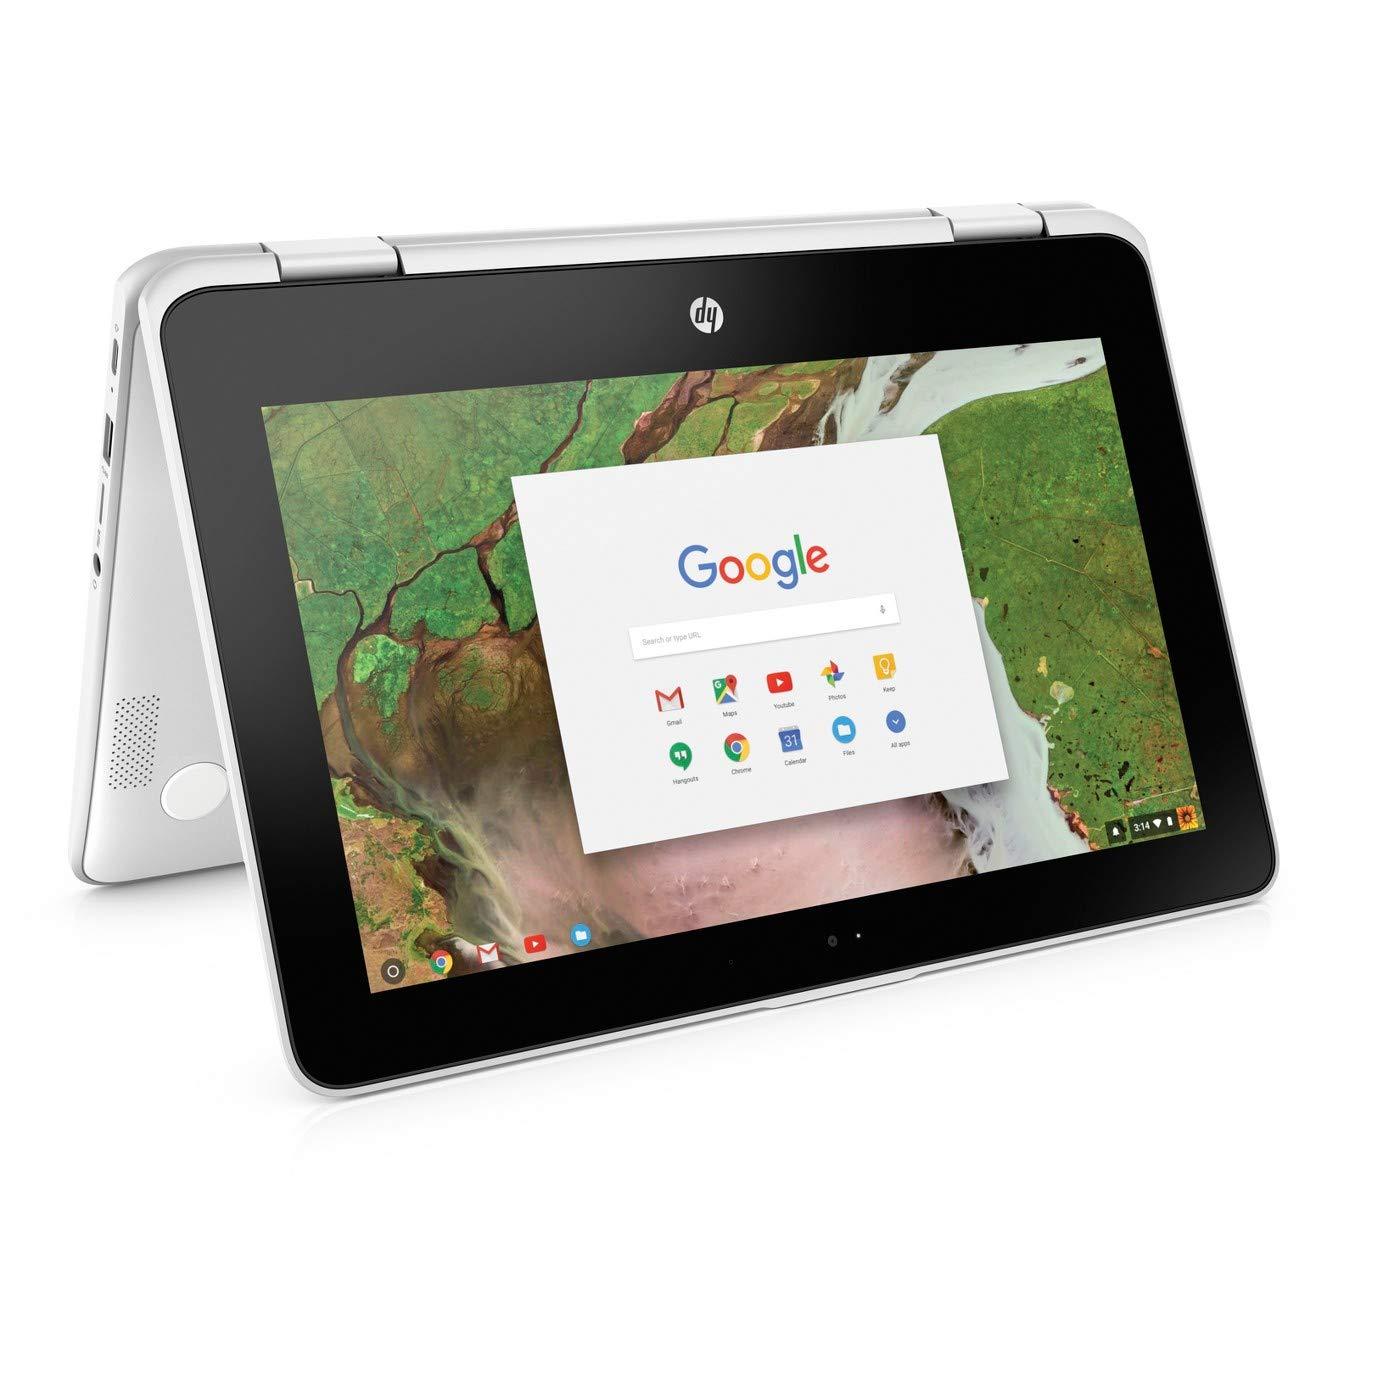 2019 HP Chromebook x360 11.6'' HD High Performance 2-in-1 Tablet Laptop Computer, Intel Celeron N3350 up to 2.4GHz, 4GB DDR4 RAM, 32GB eMMC, 2x2 802.11AC WiFi, Bluetooth 4.2, USB 3.1, Chrome OS